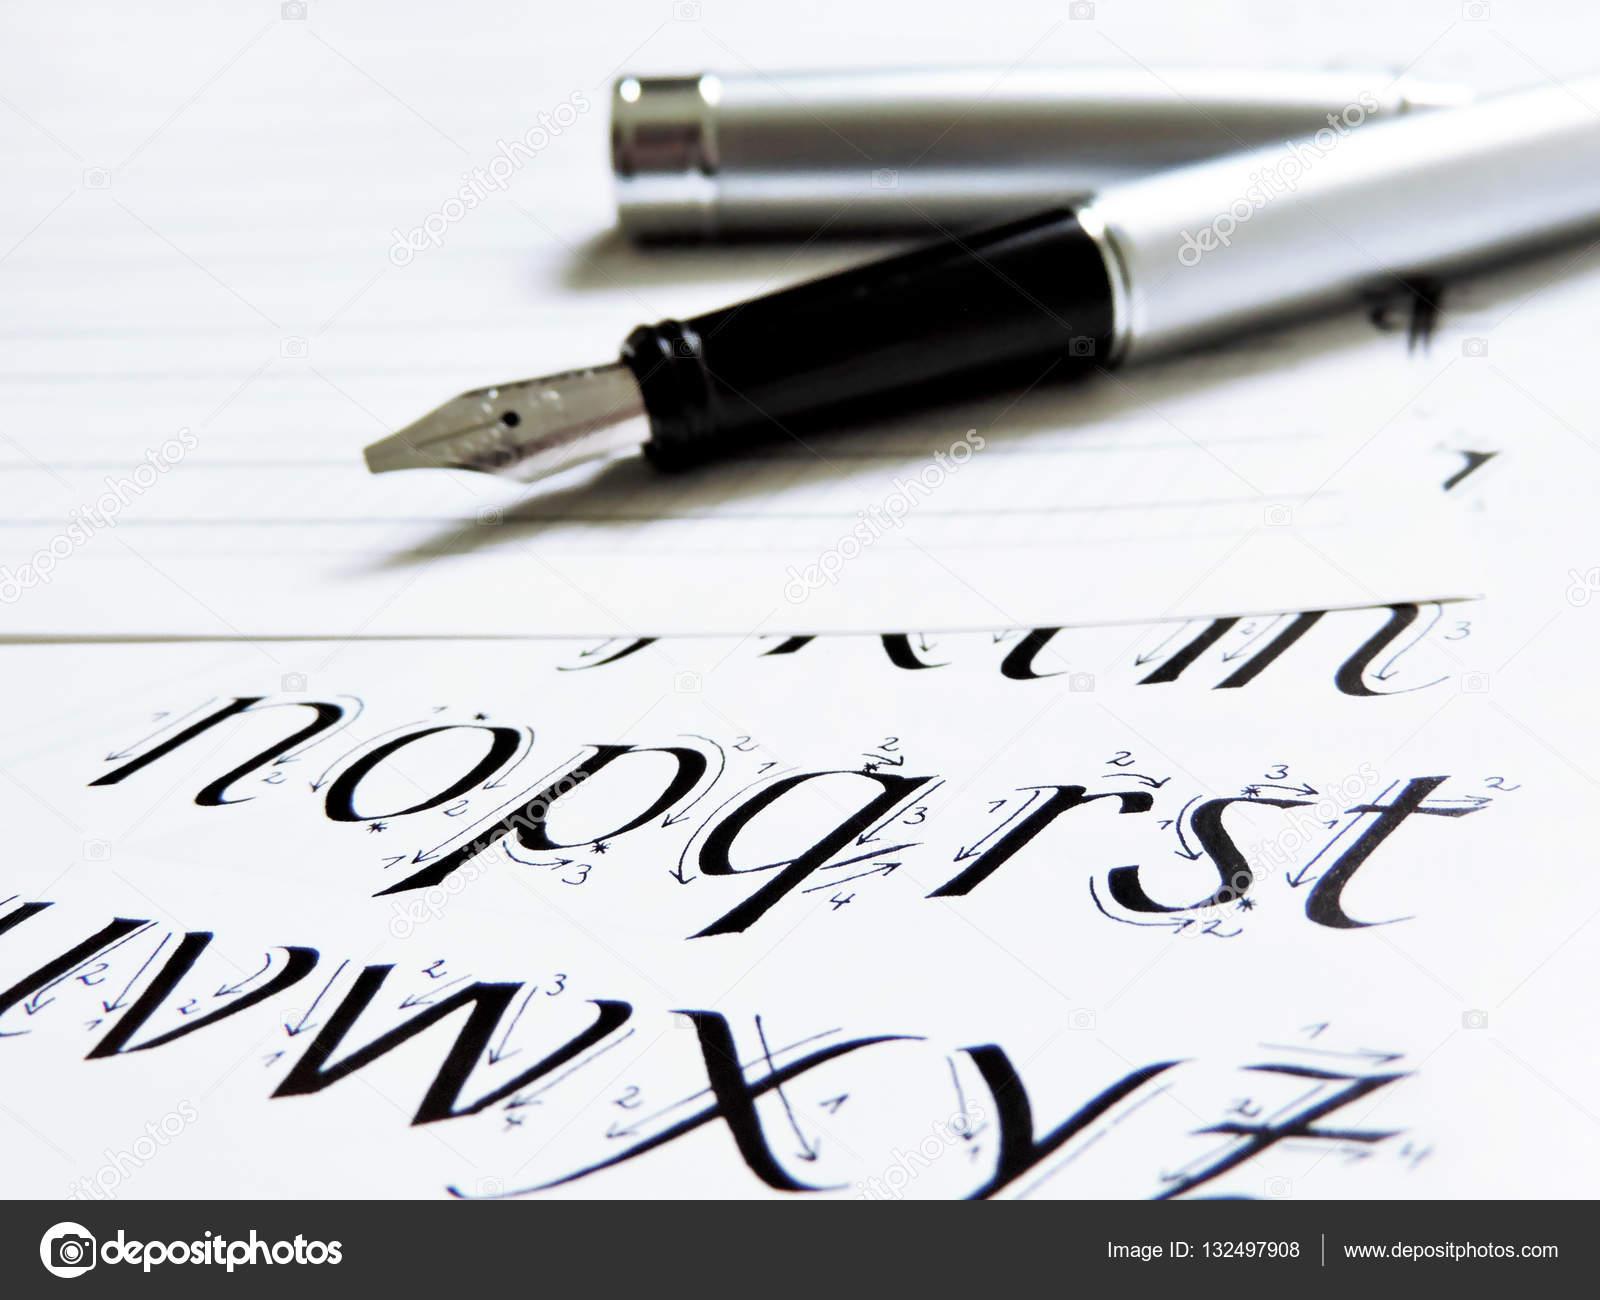 Sc�ne de calligraphie avec �l�gant stylo plume photo